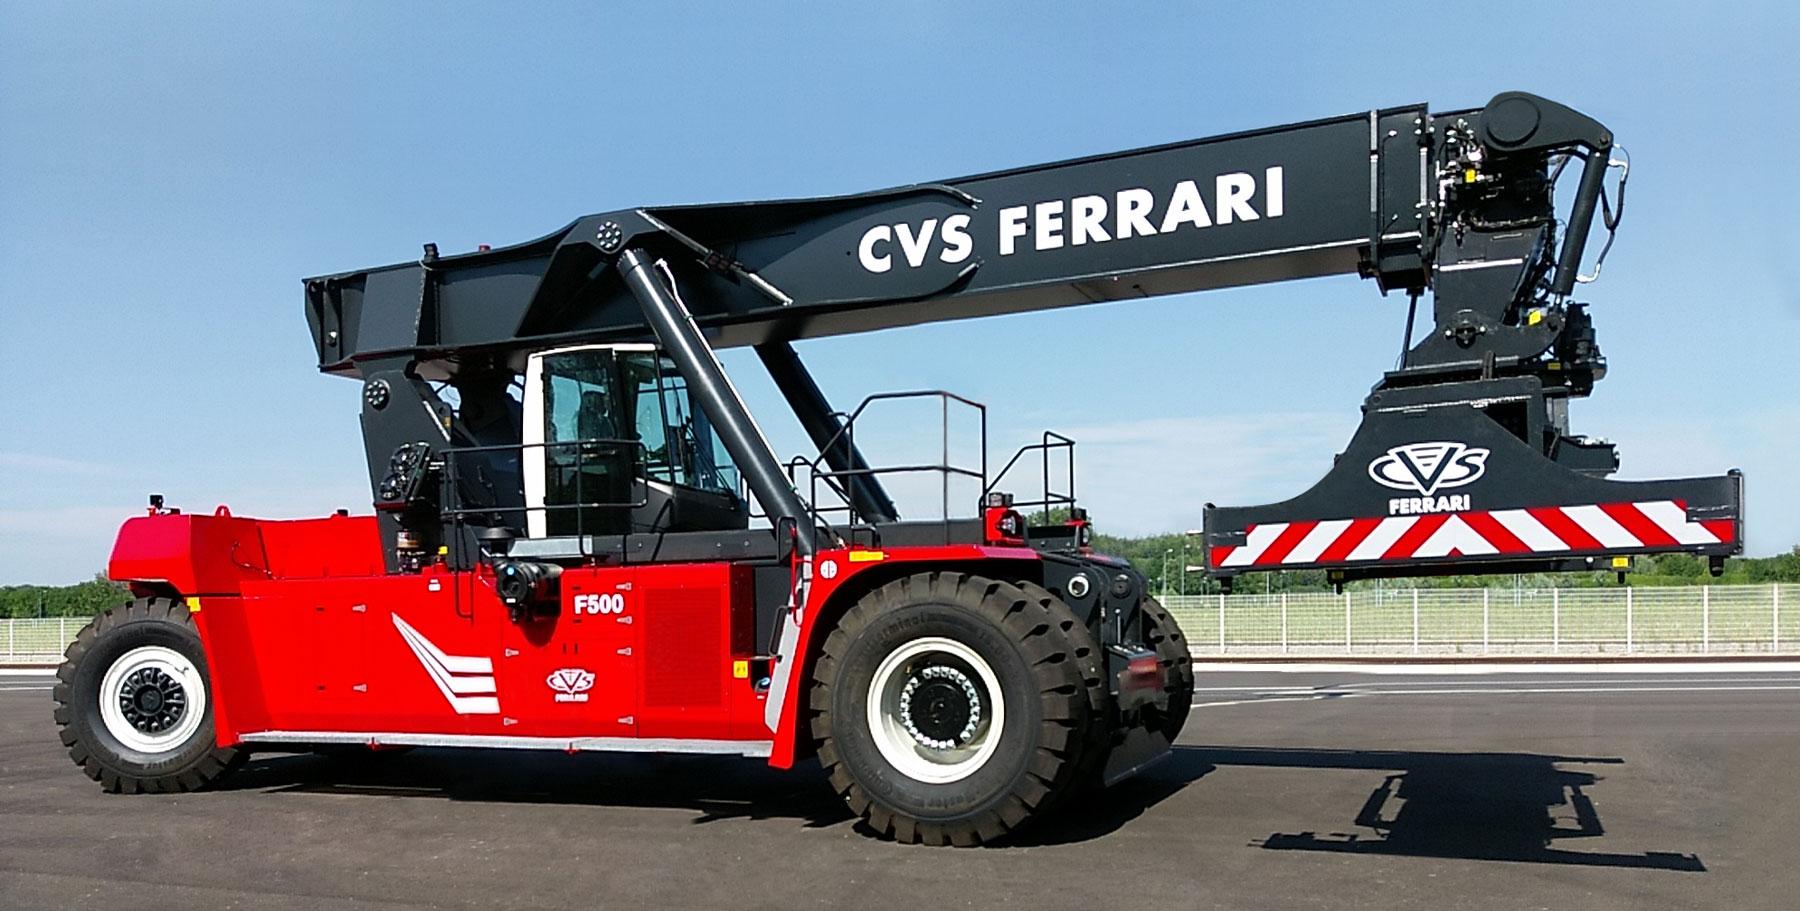 CVS FERRARI - RS8 STRASBOURGH